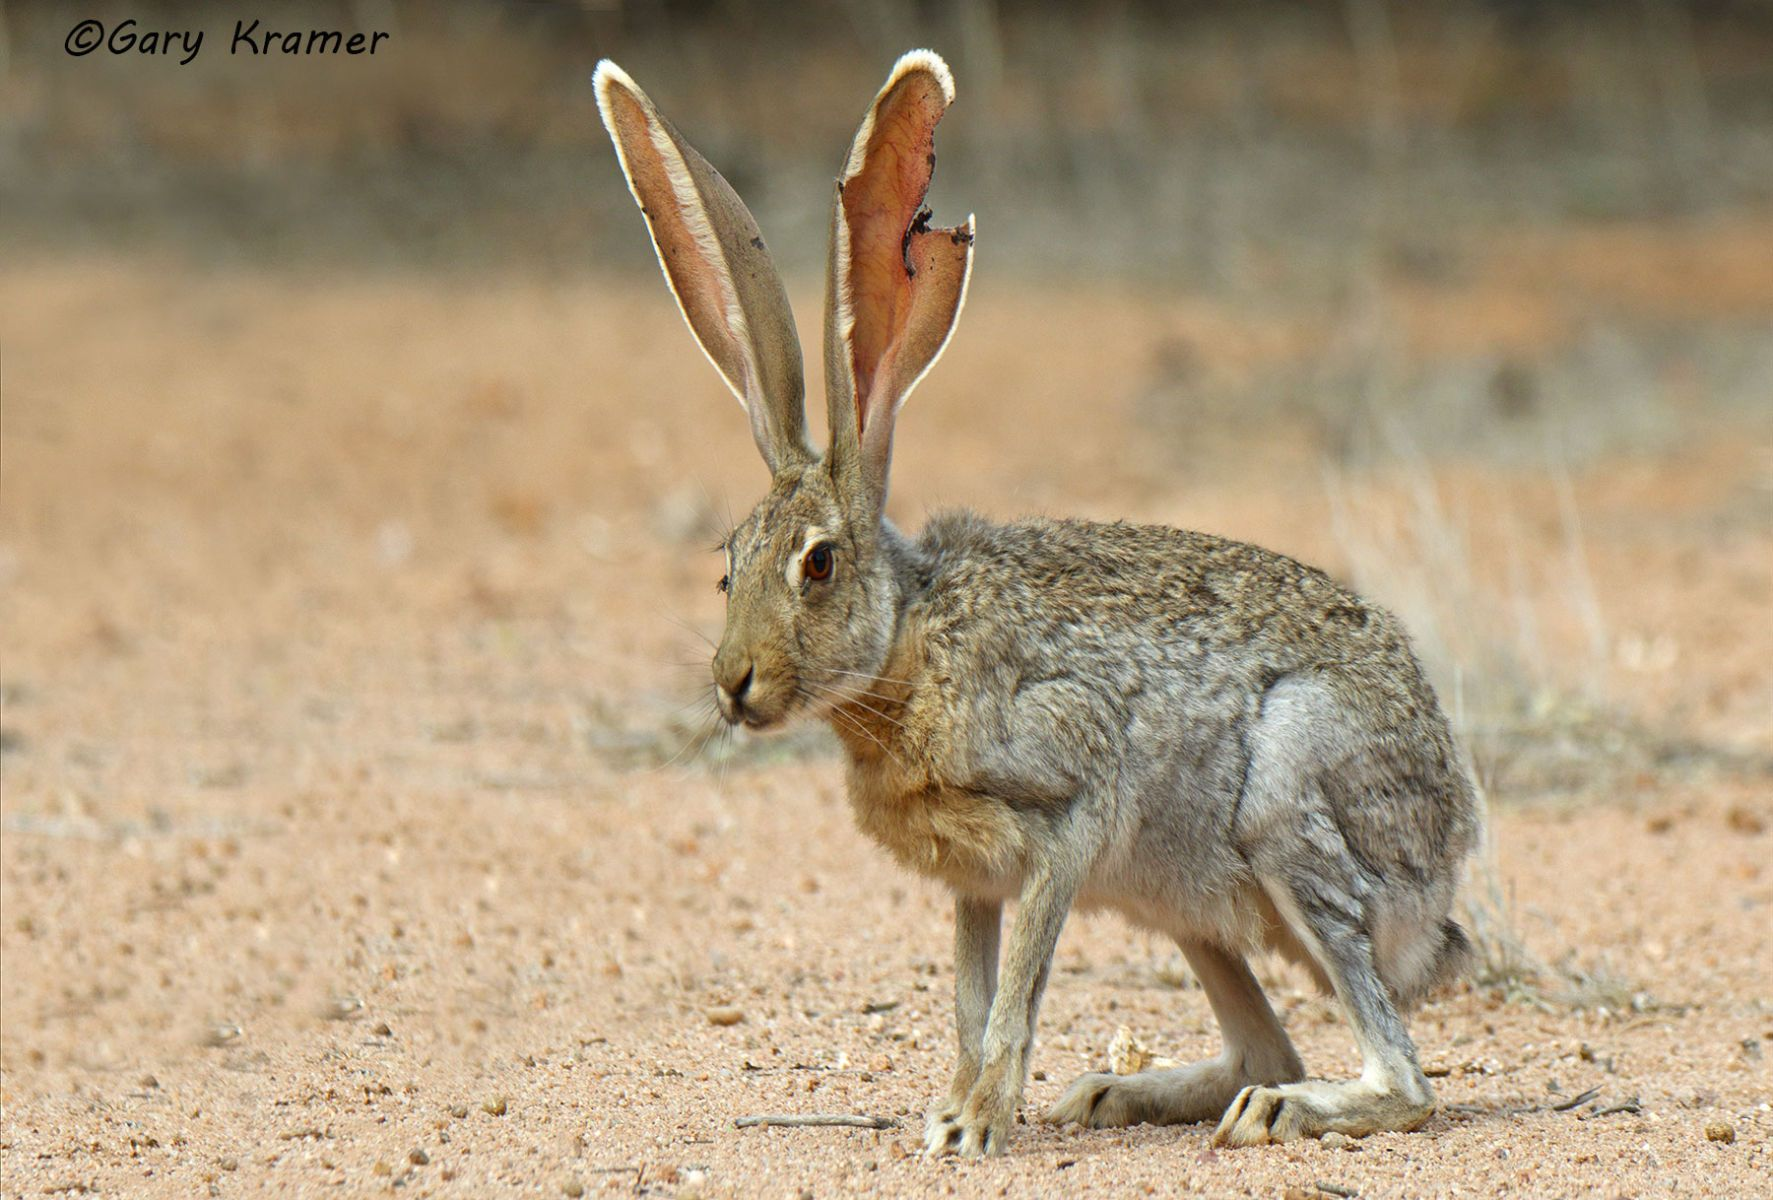 Antelope Jackrabbit (Lepus alleni) - NMRa#018d